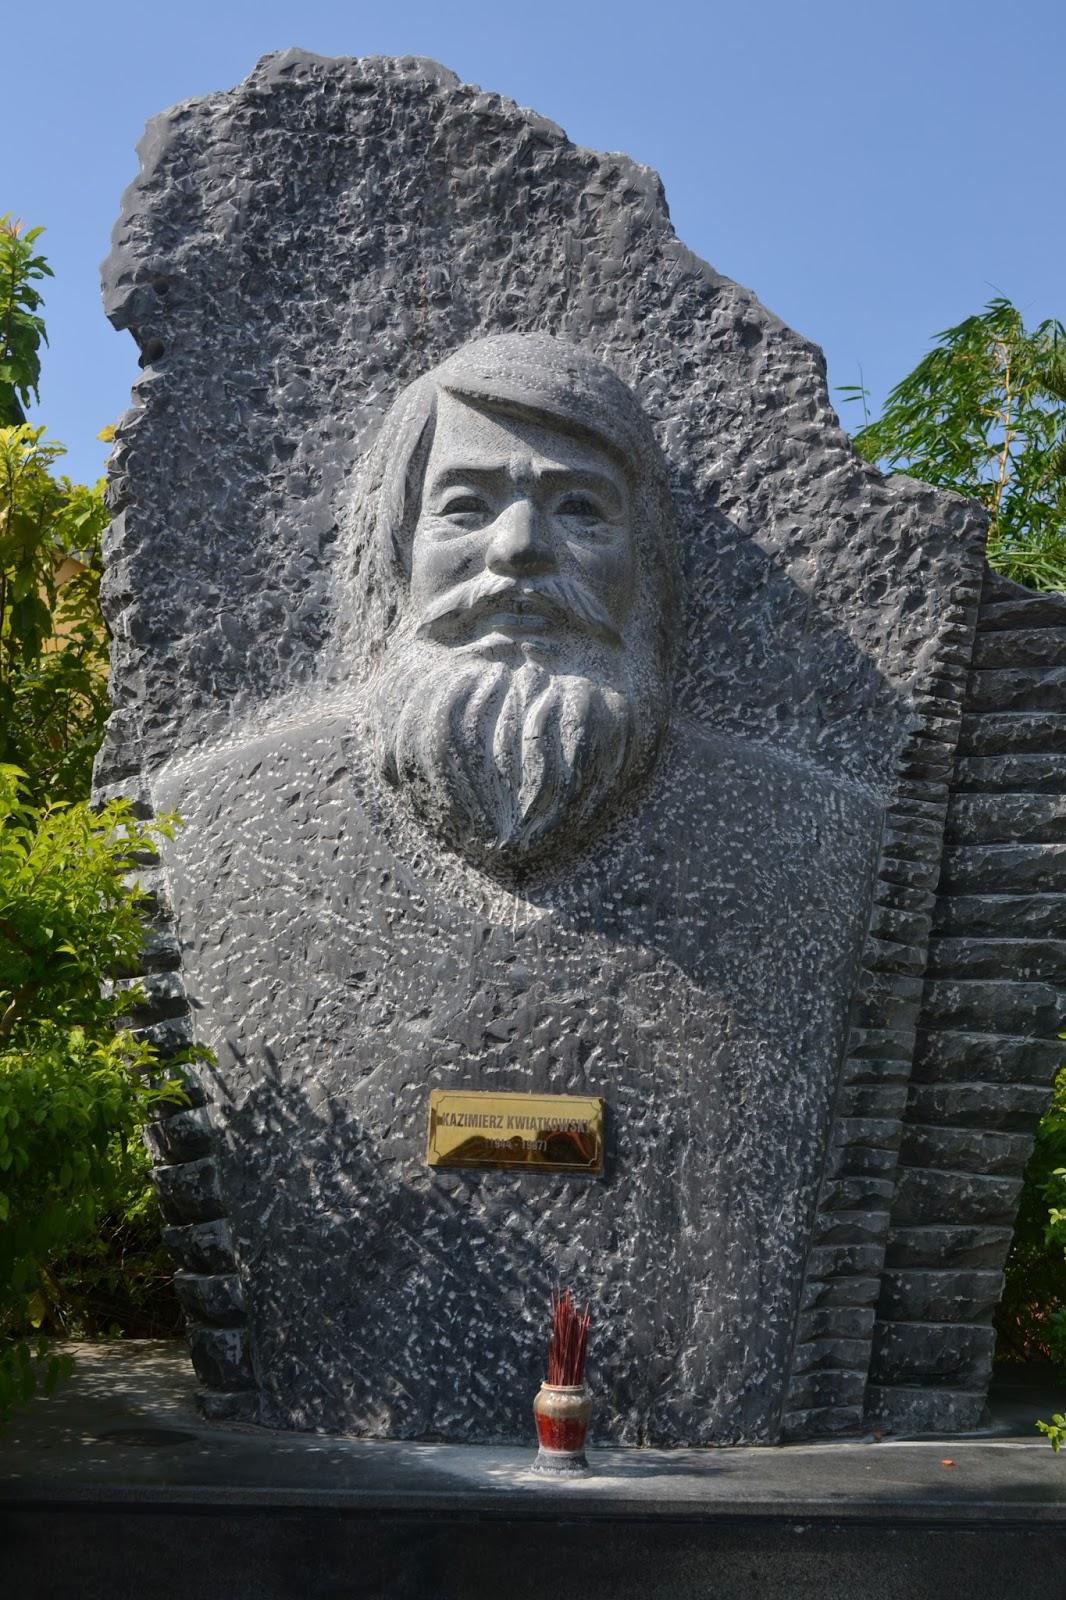 Statue of Kazimierz Kwiatkowski  in old town, hoi an